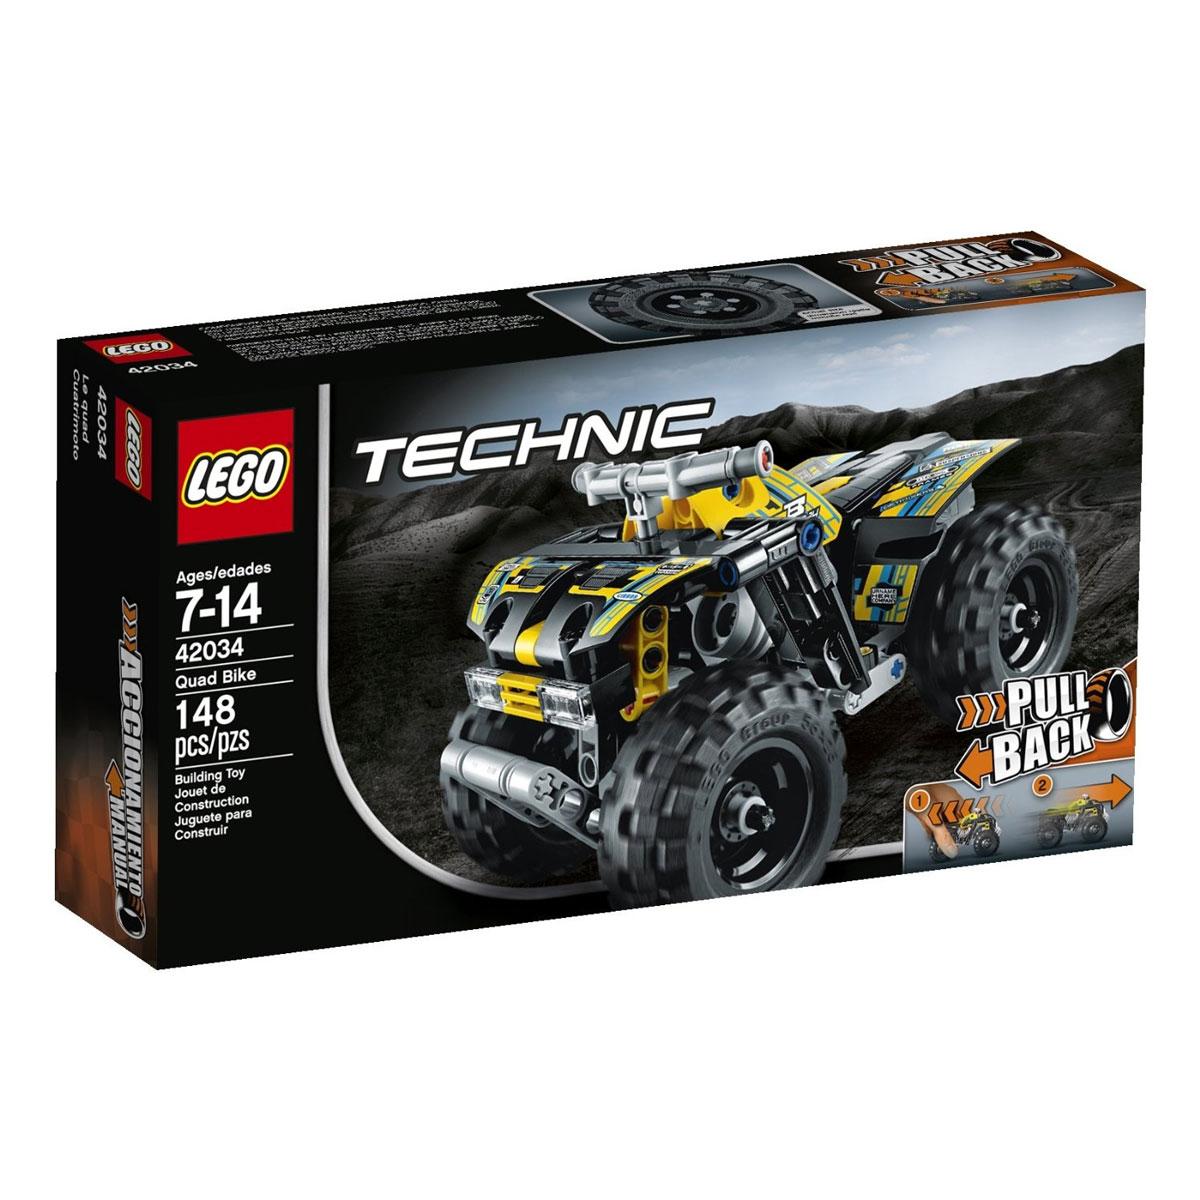 LEGO Technic Конструктор Квадроцикл 42034